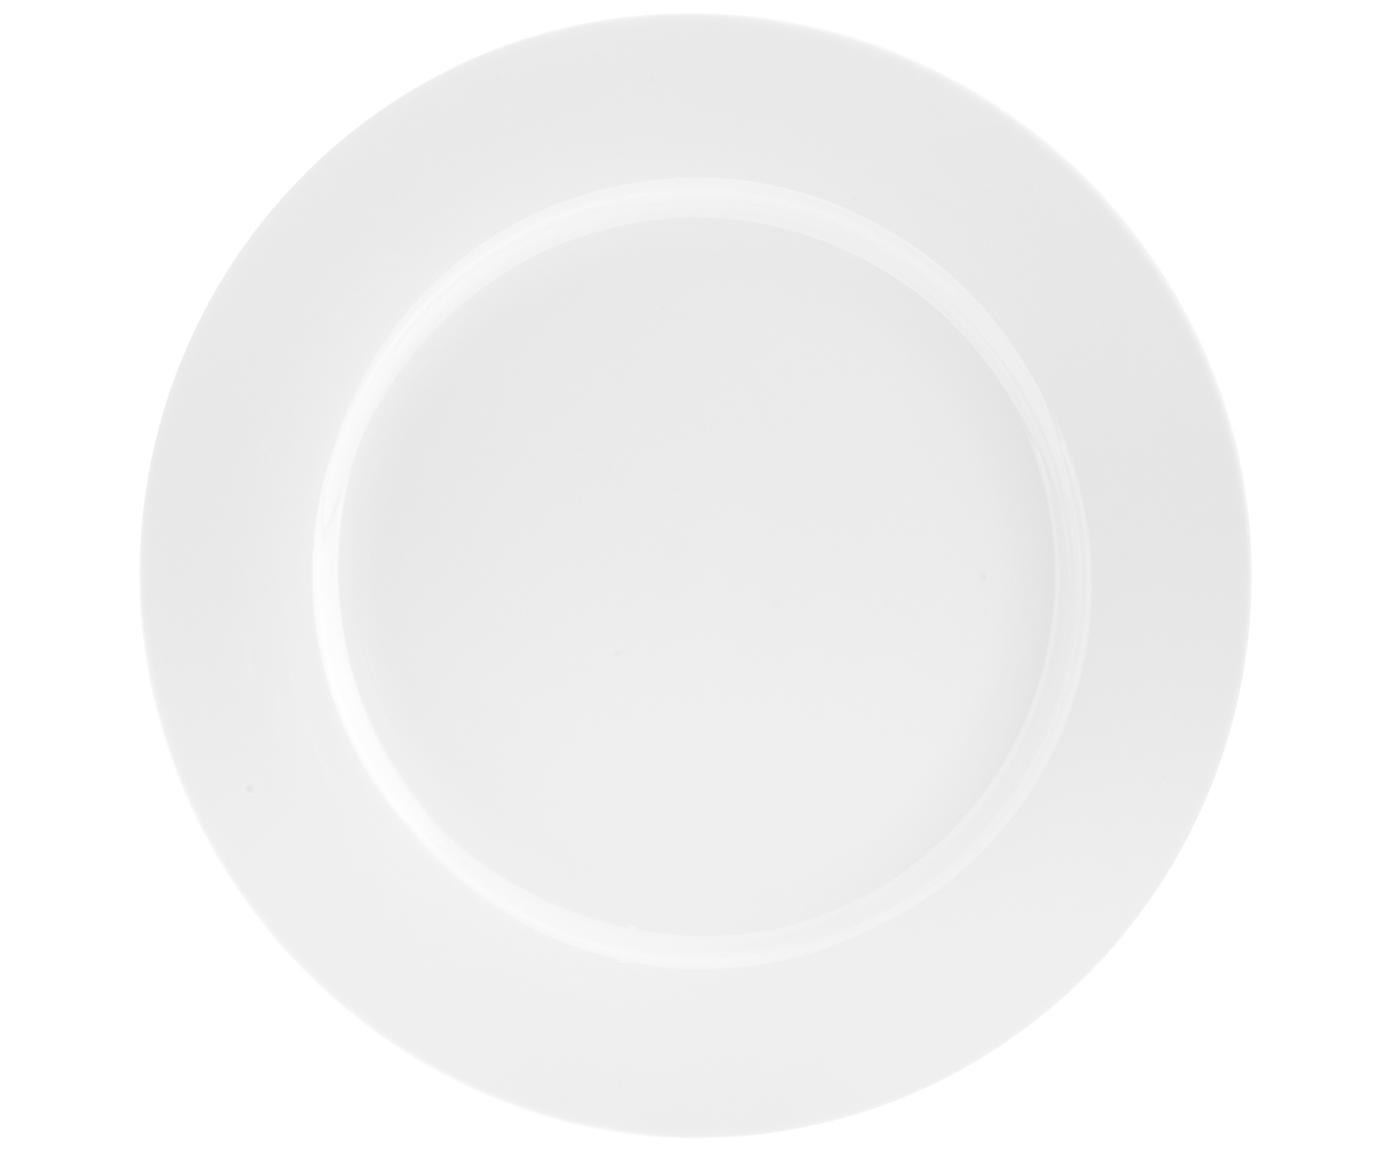 Platos llanos Delight Classic, 2uds., Porcelana, Blanco, Ø 27 cm